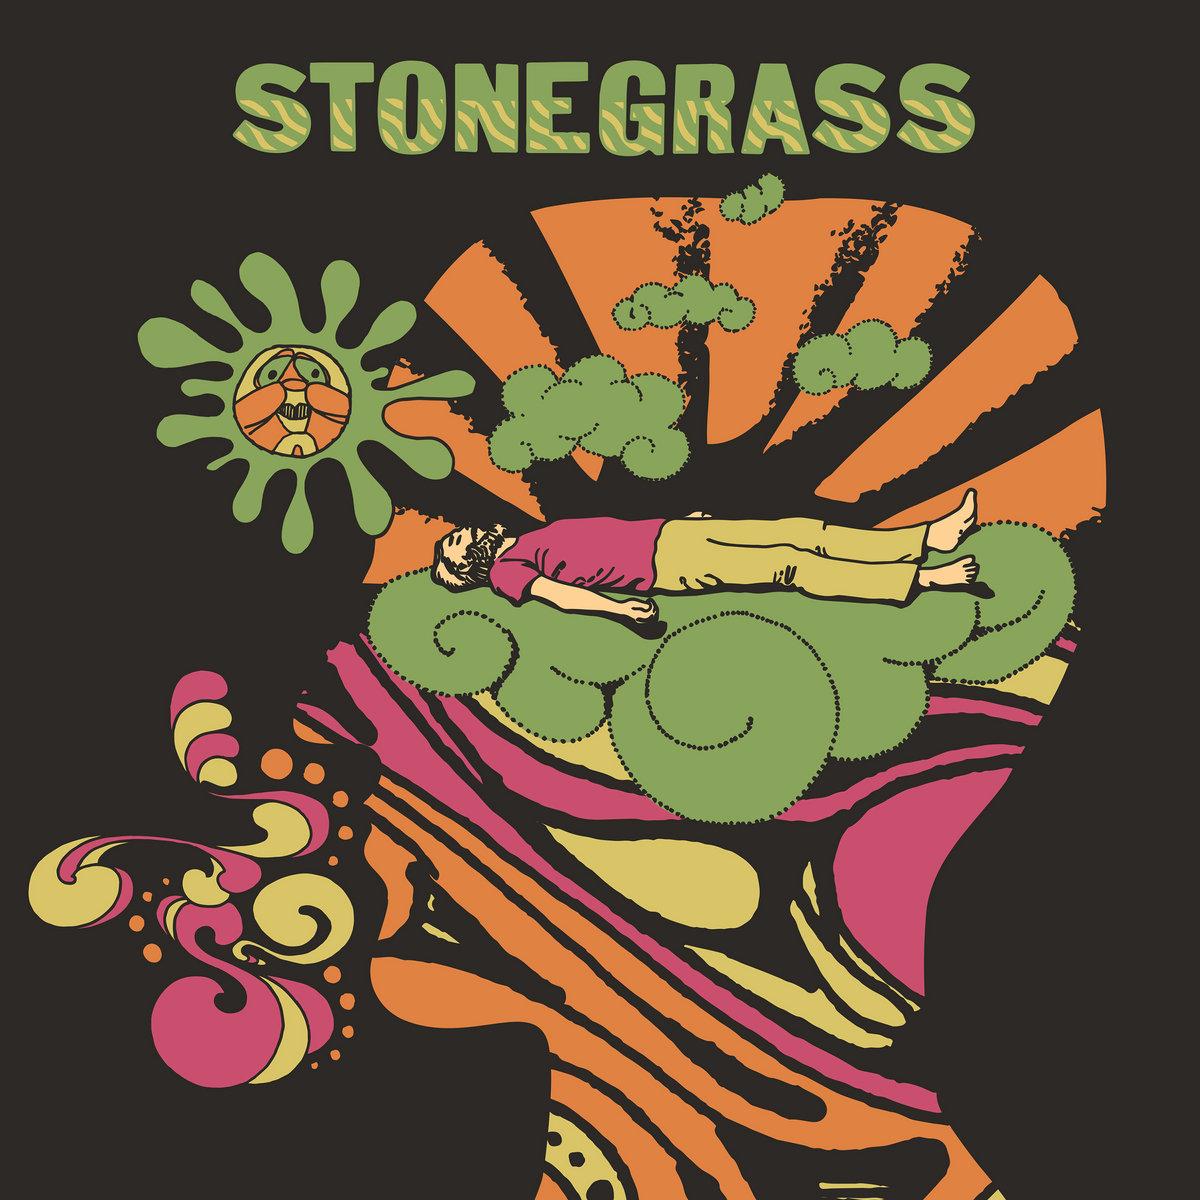 stonegrass self titled